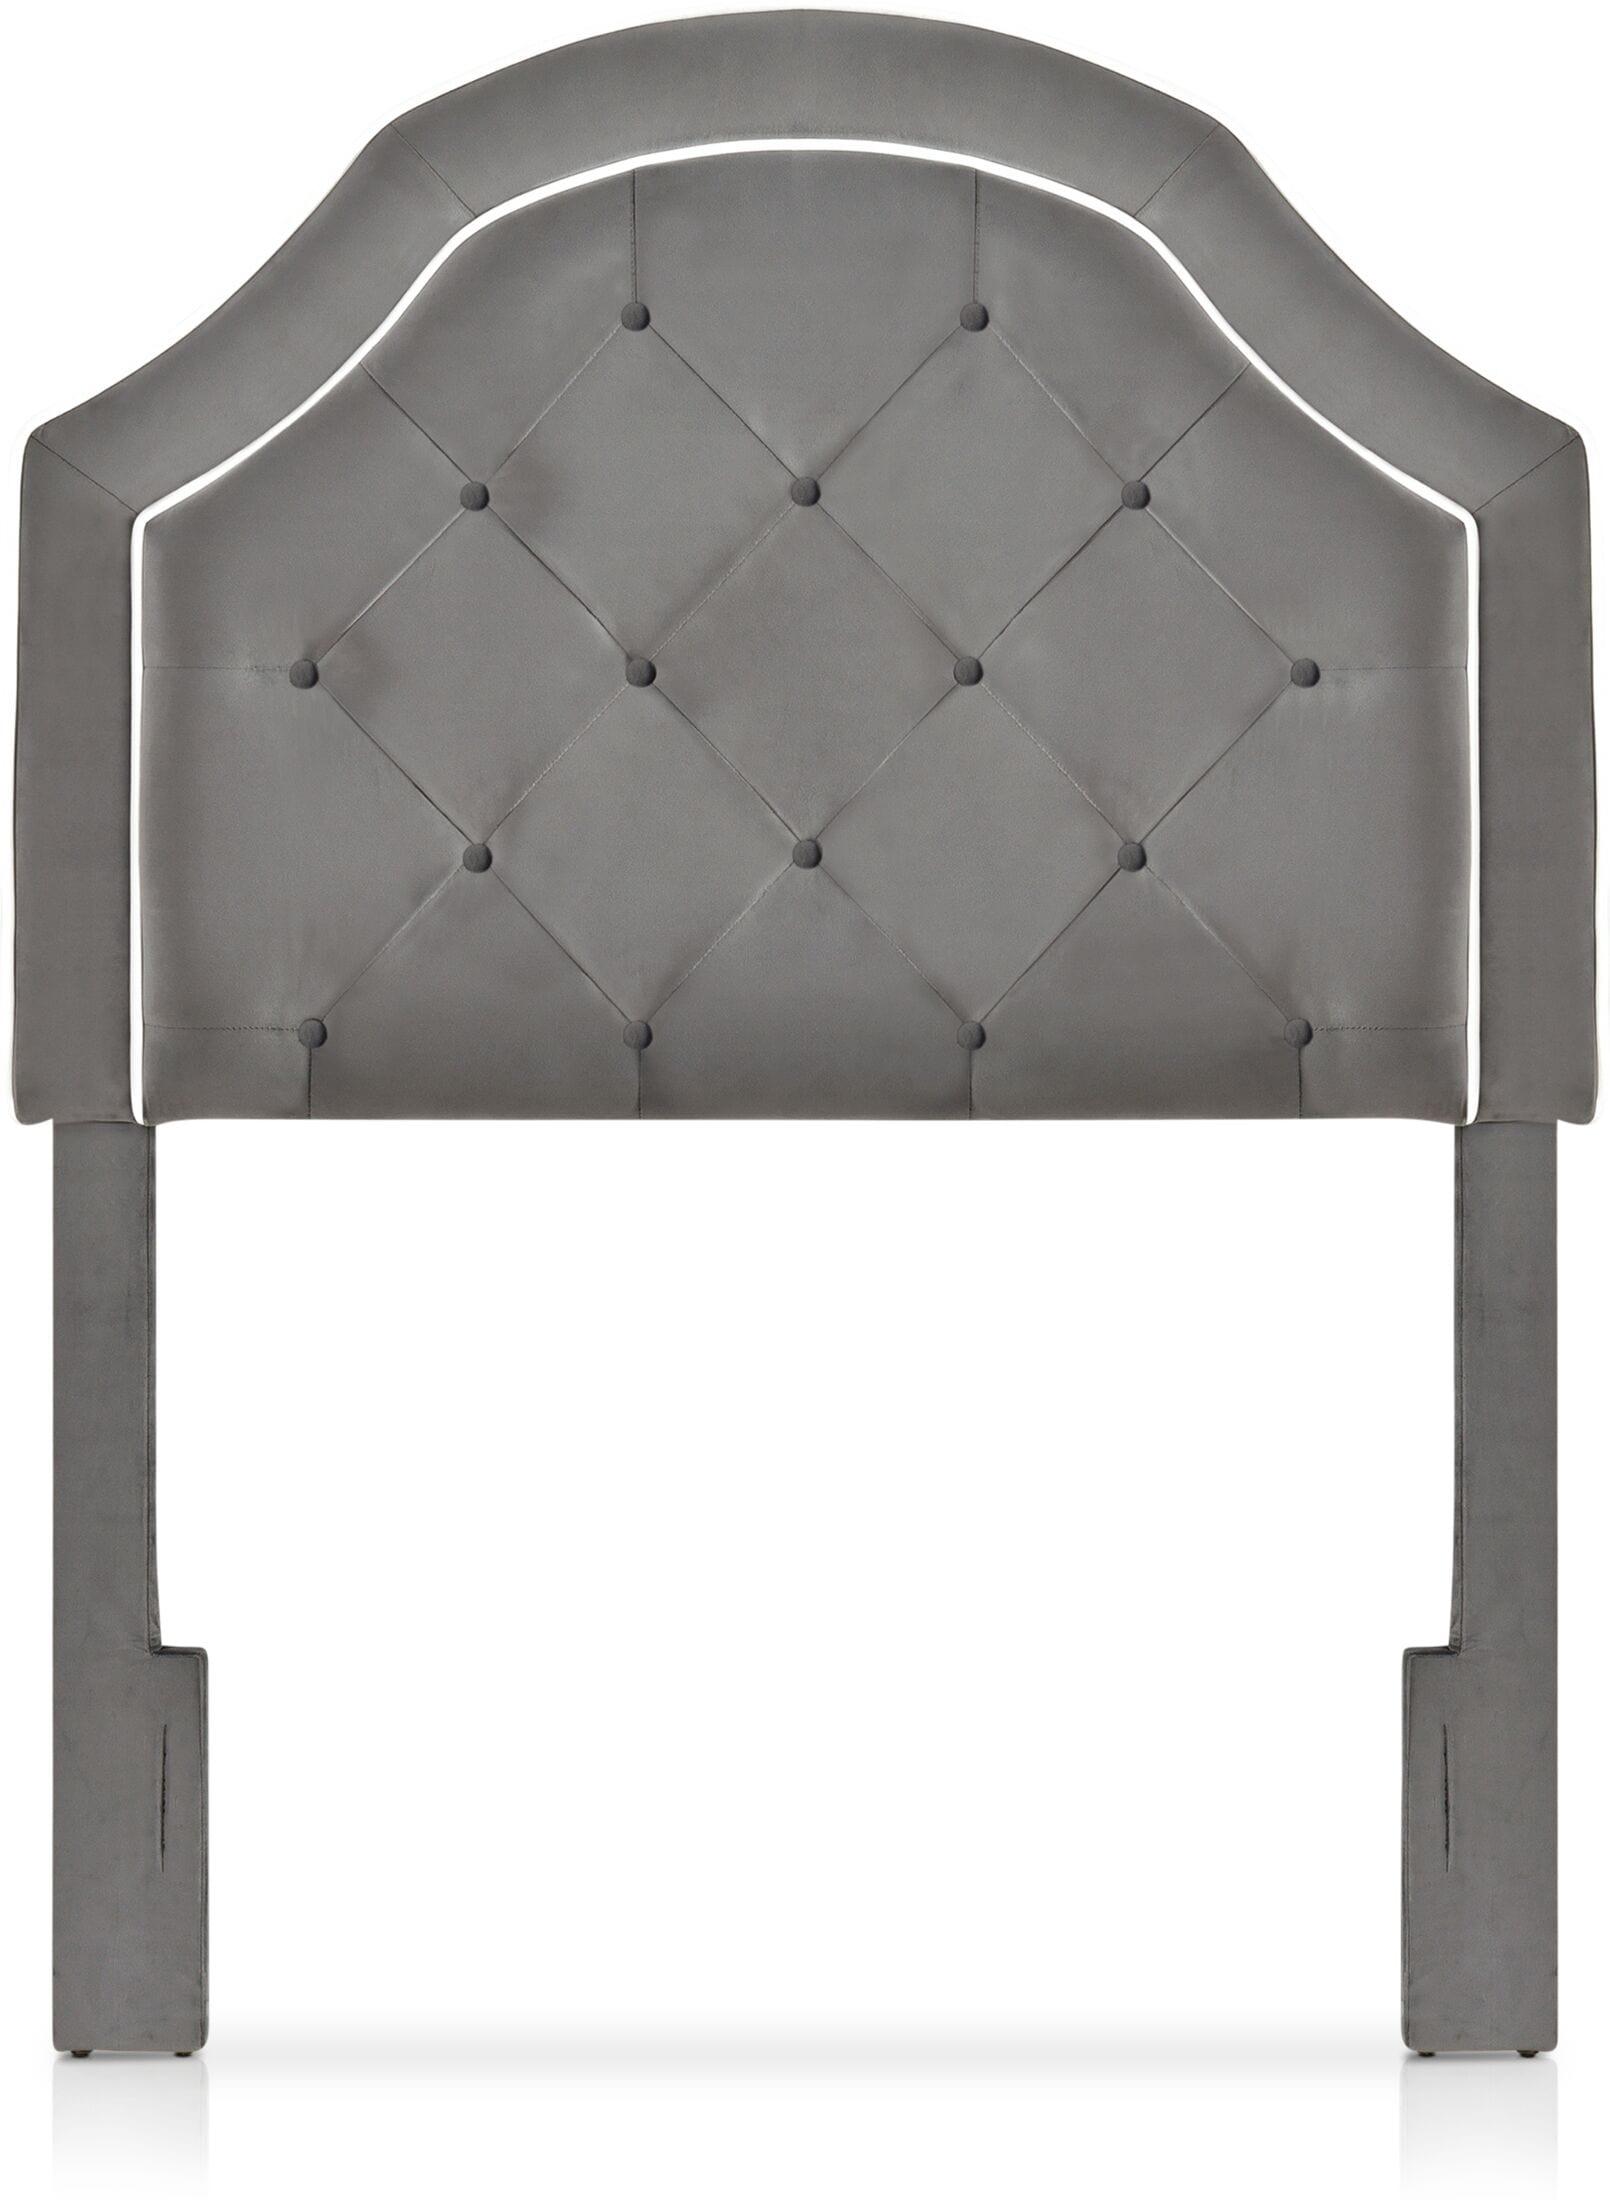 Bedroom Furniture - Aurora Upholstered Headboard